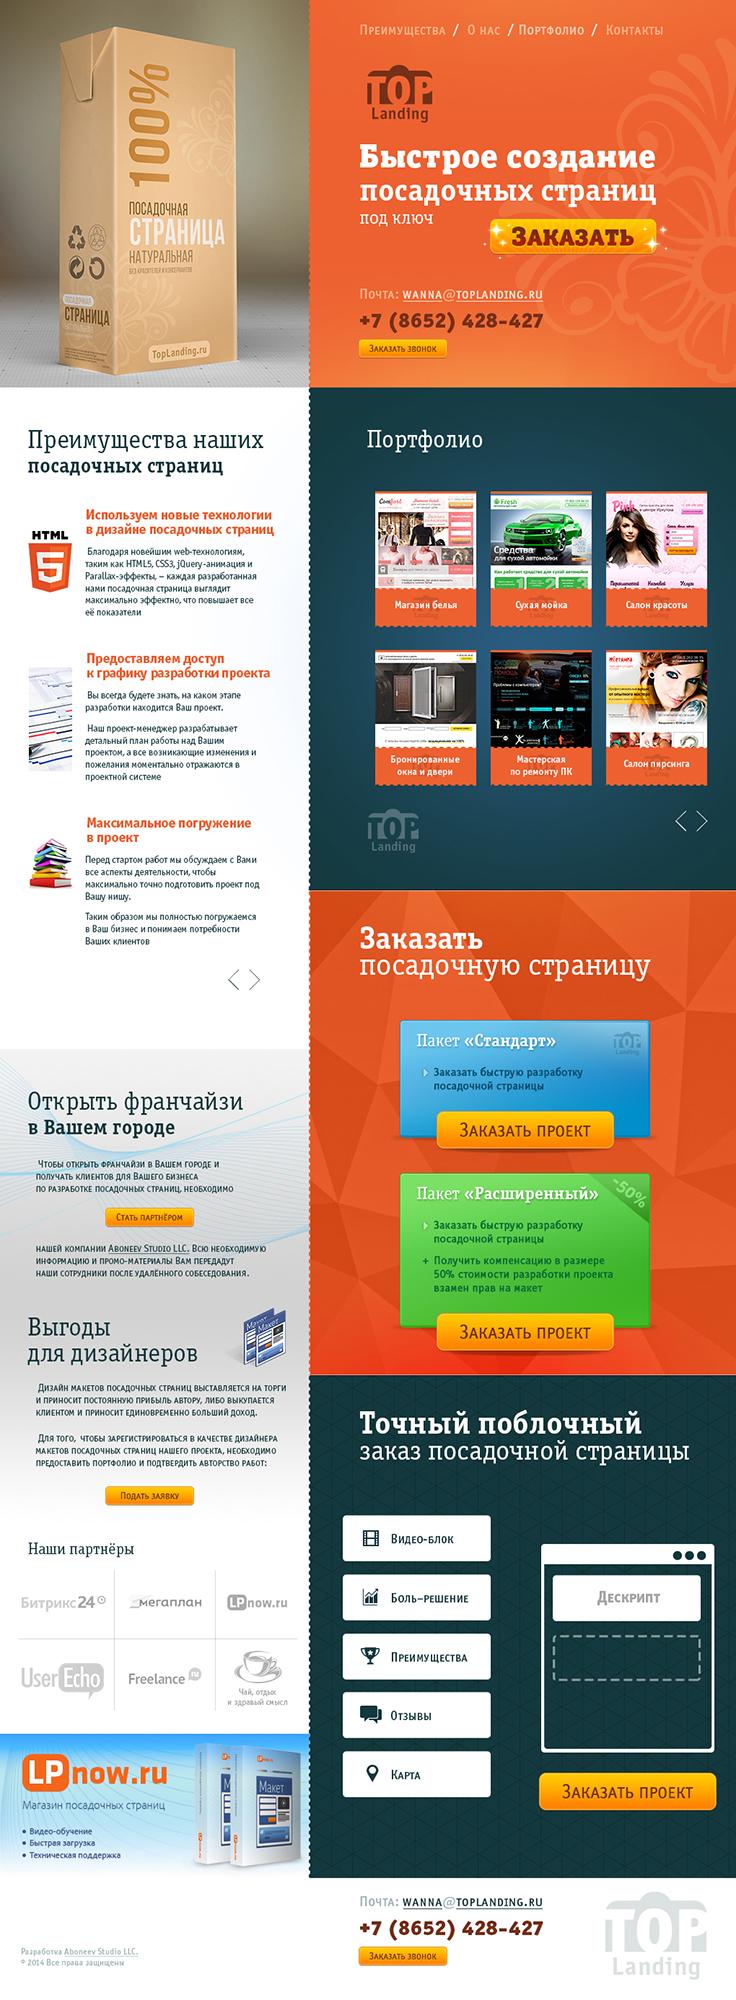 TopLanding.ru